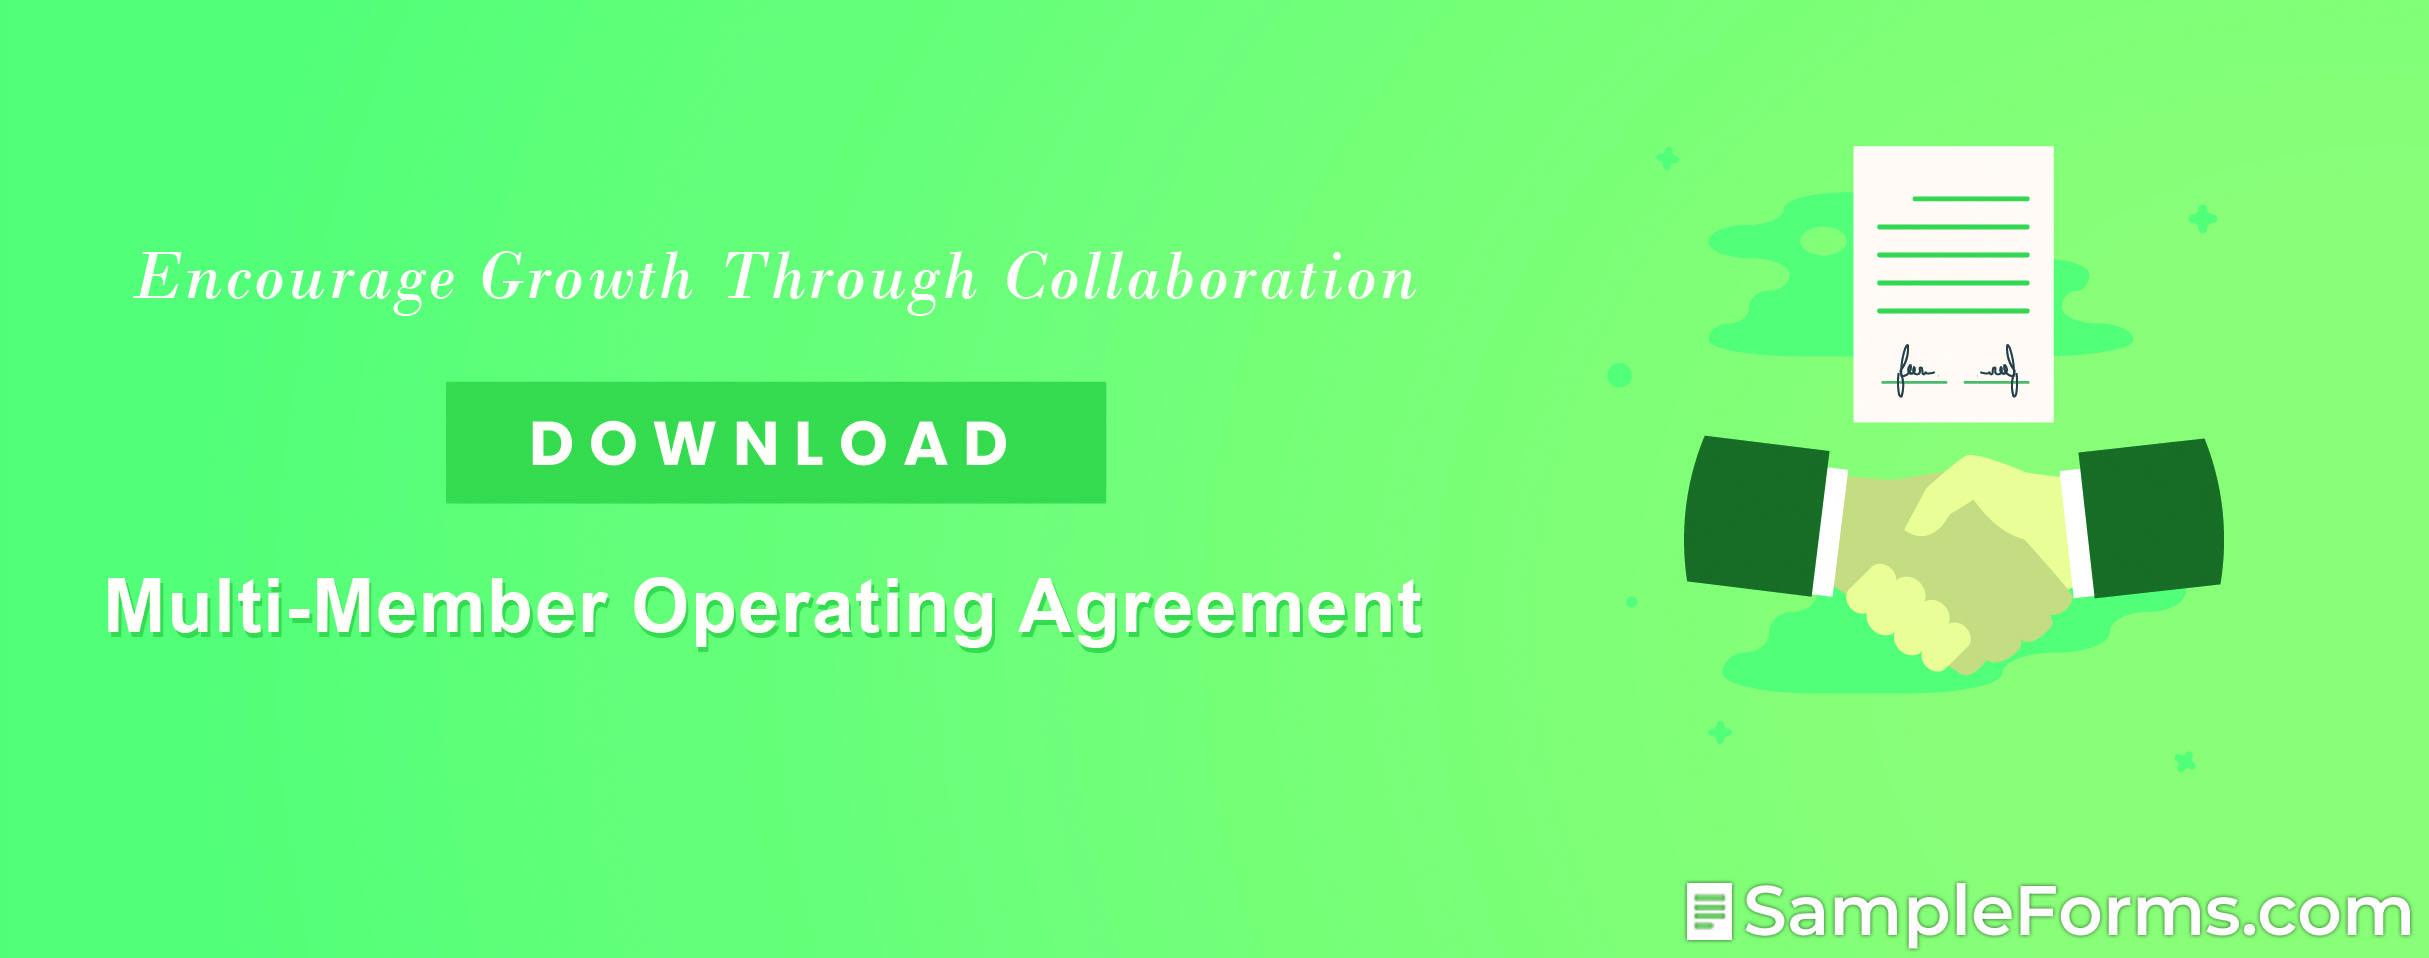 Multi Member Operating Agreement1